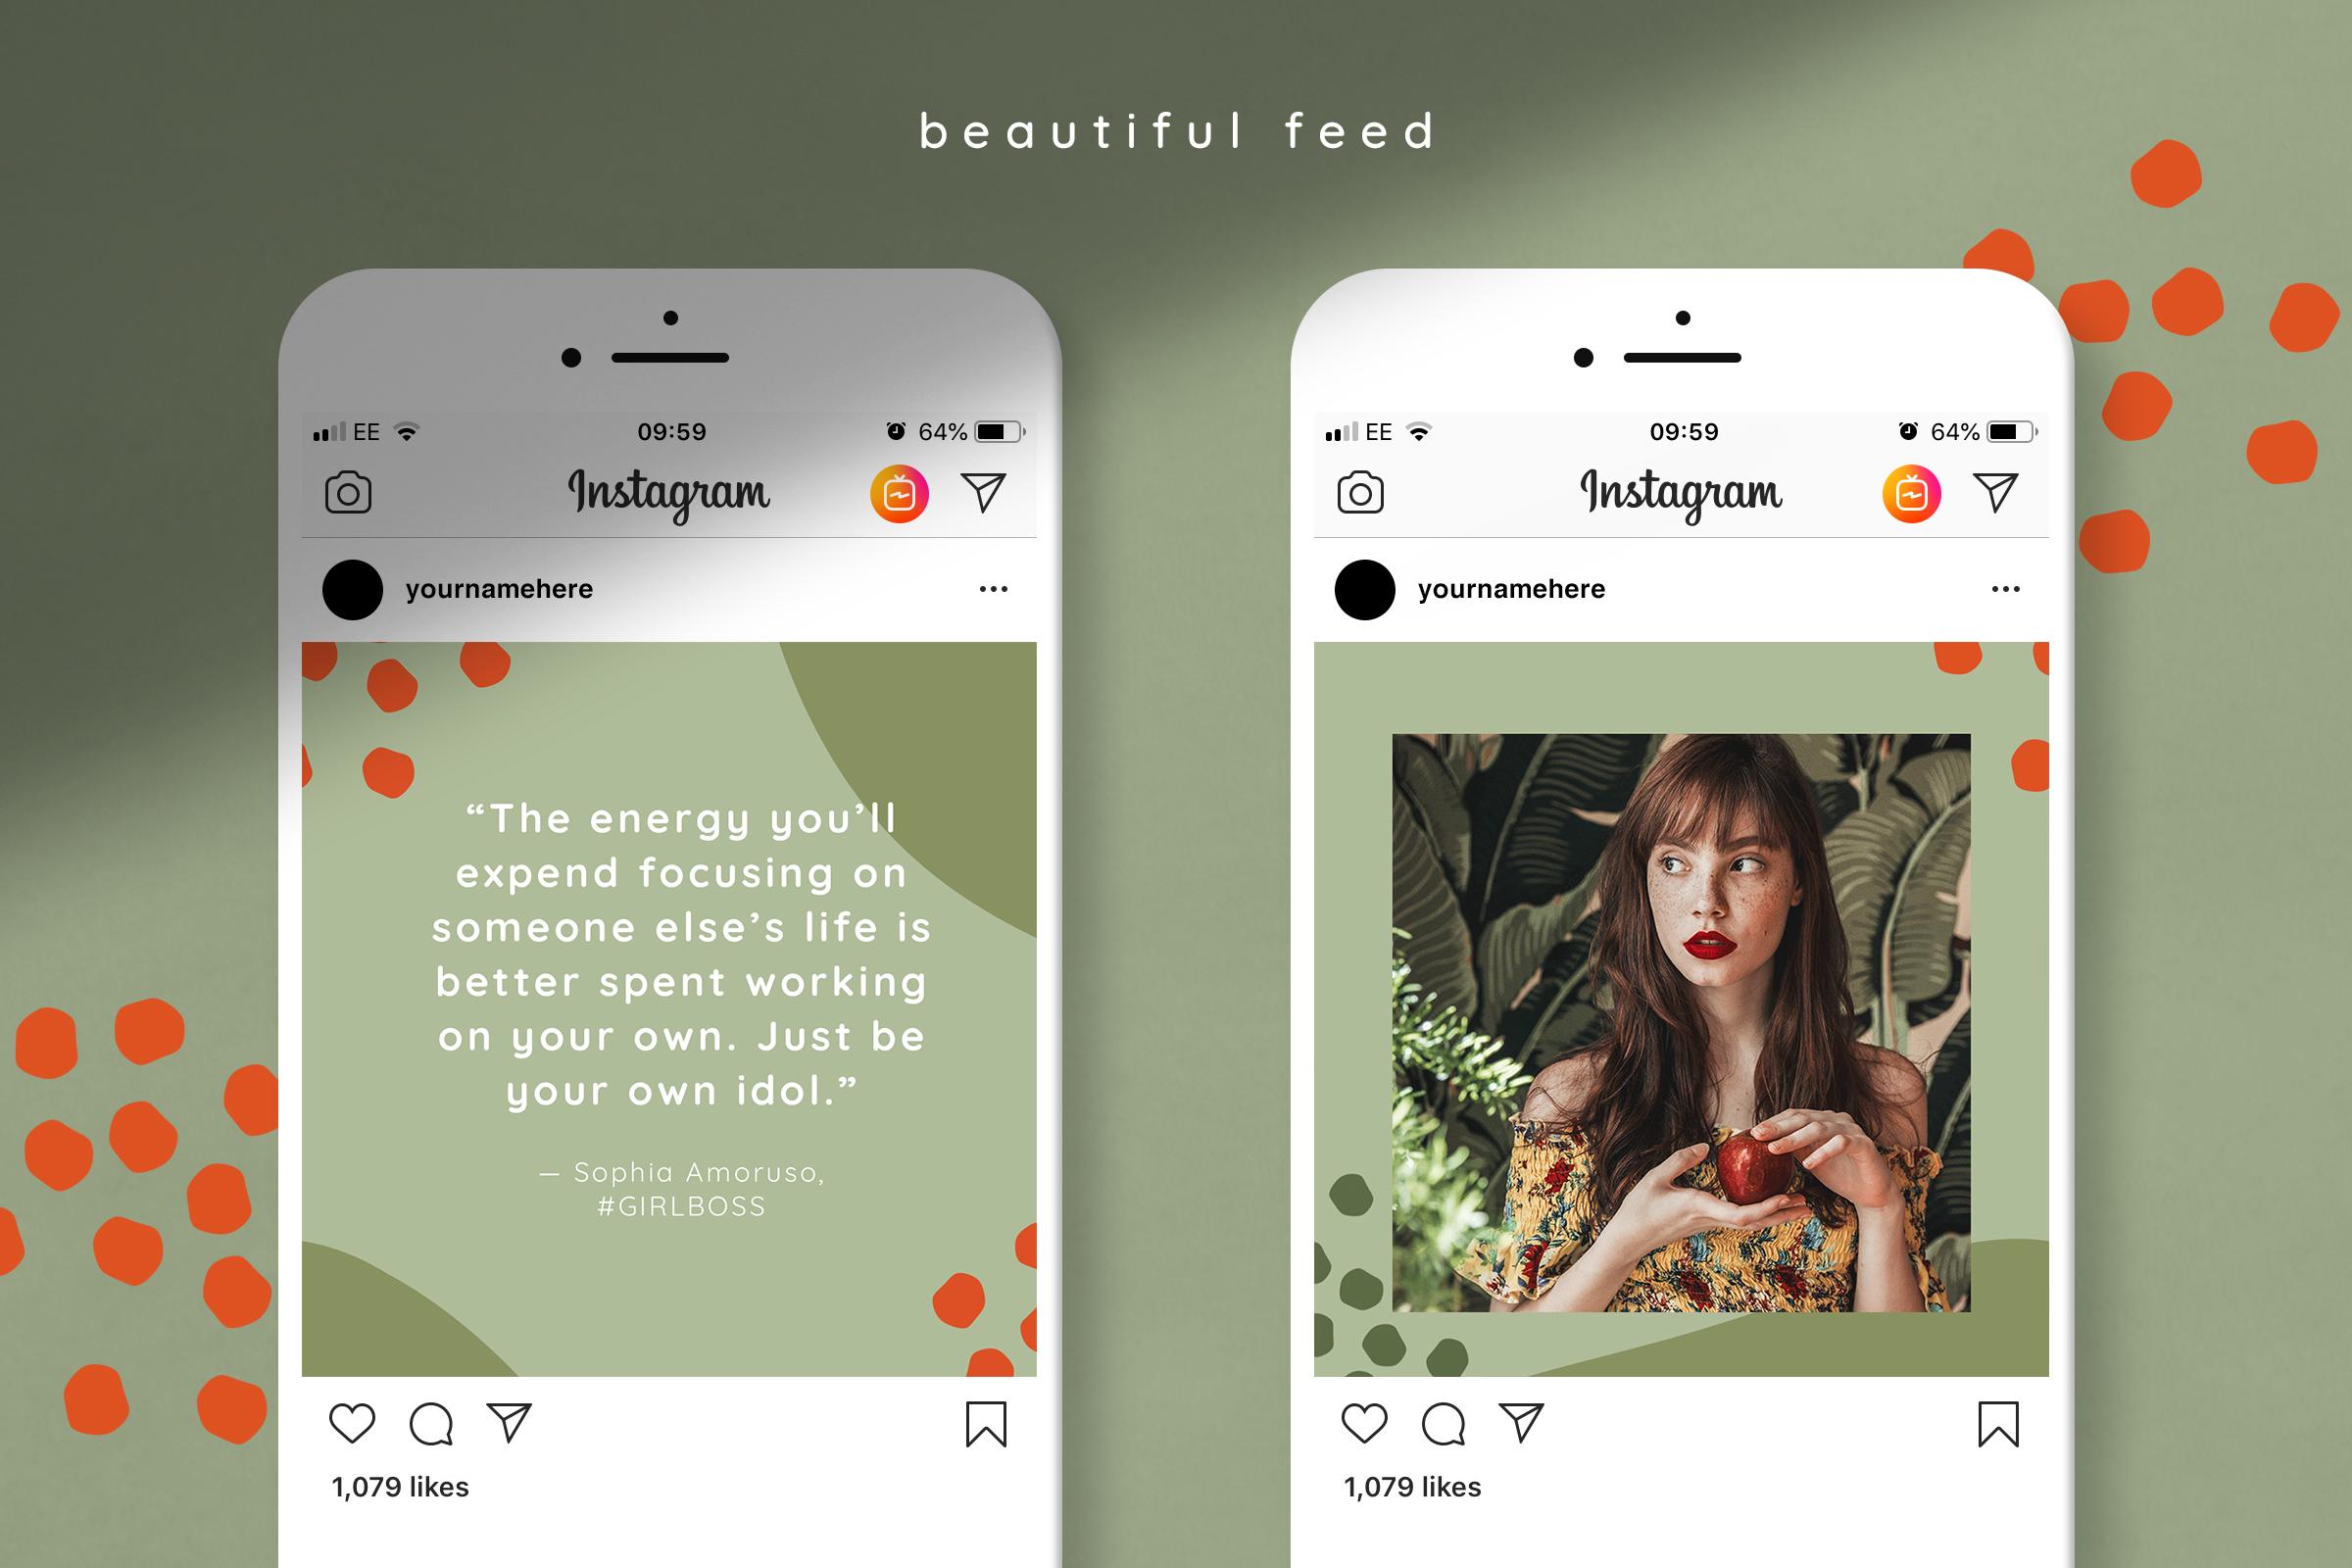 摄影照片朋友圈展示INS风模板图文排版PSD海报 Instagram Quotes Puzzle Template插图(3)